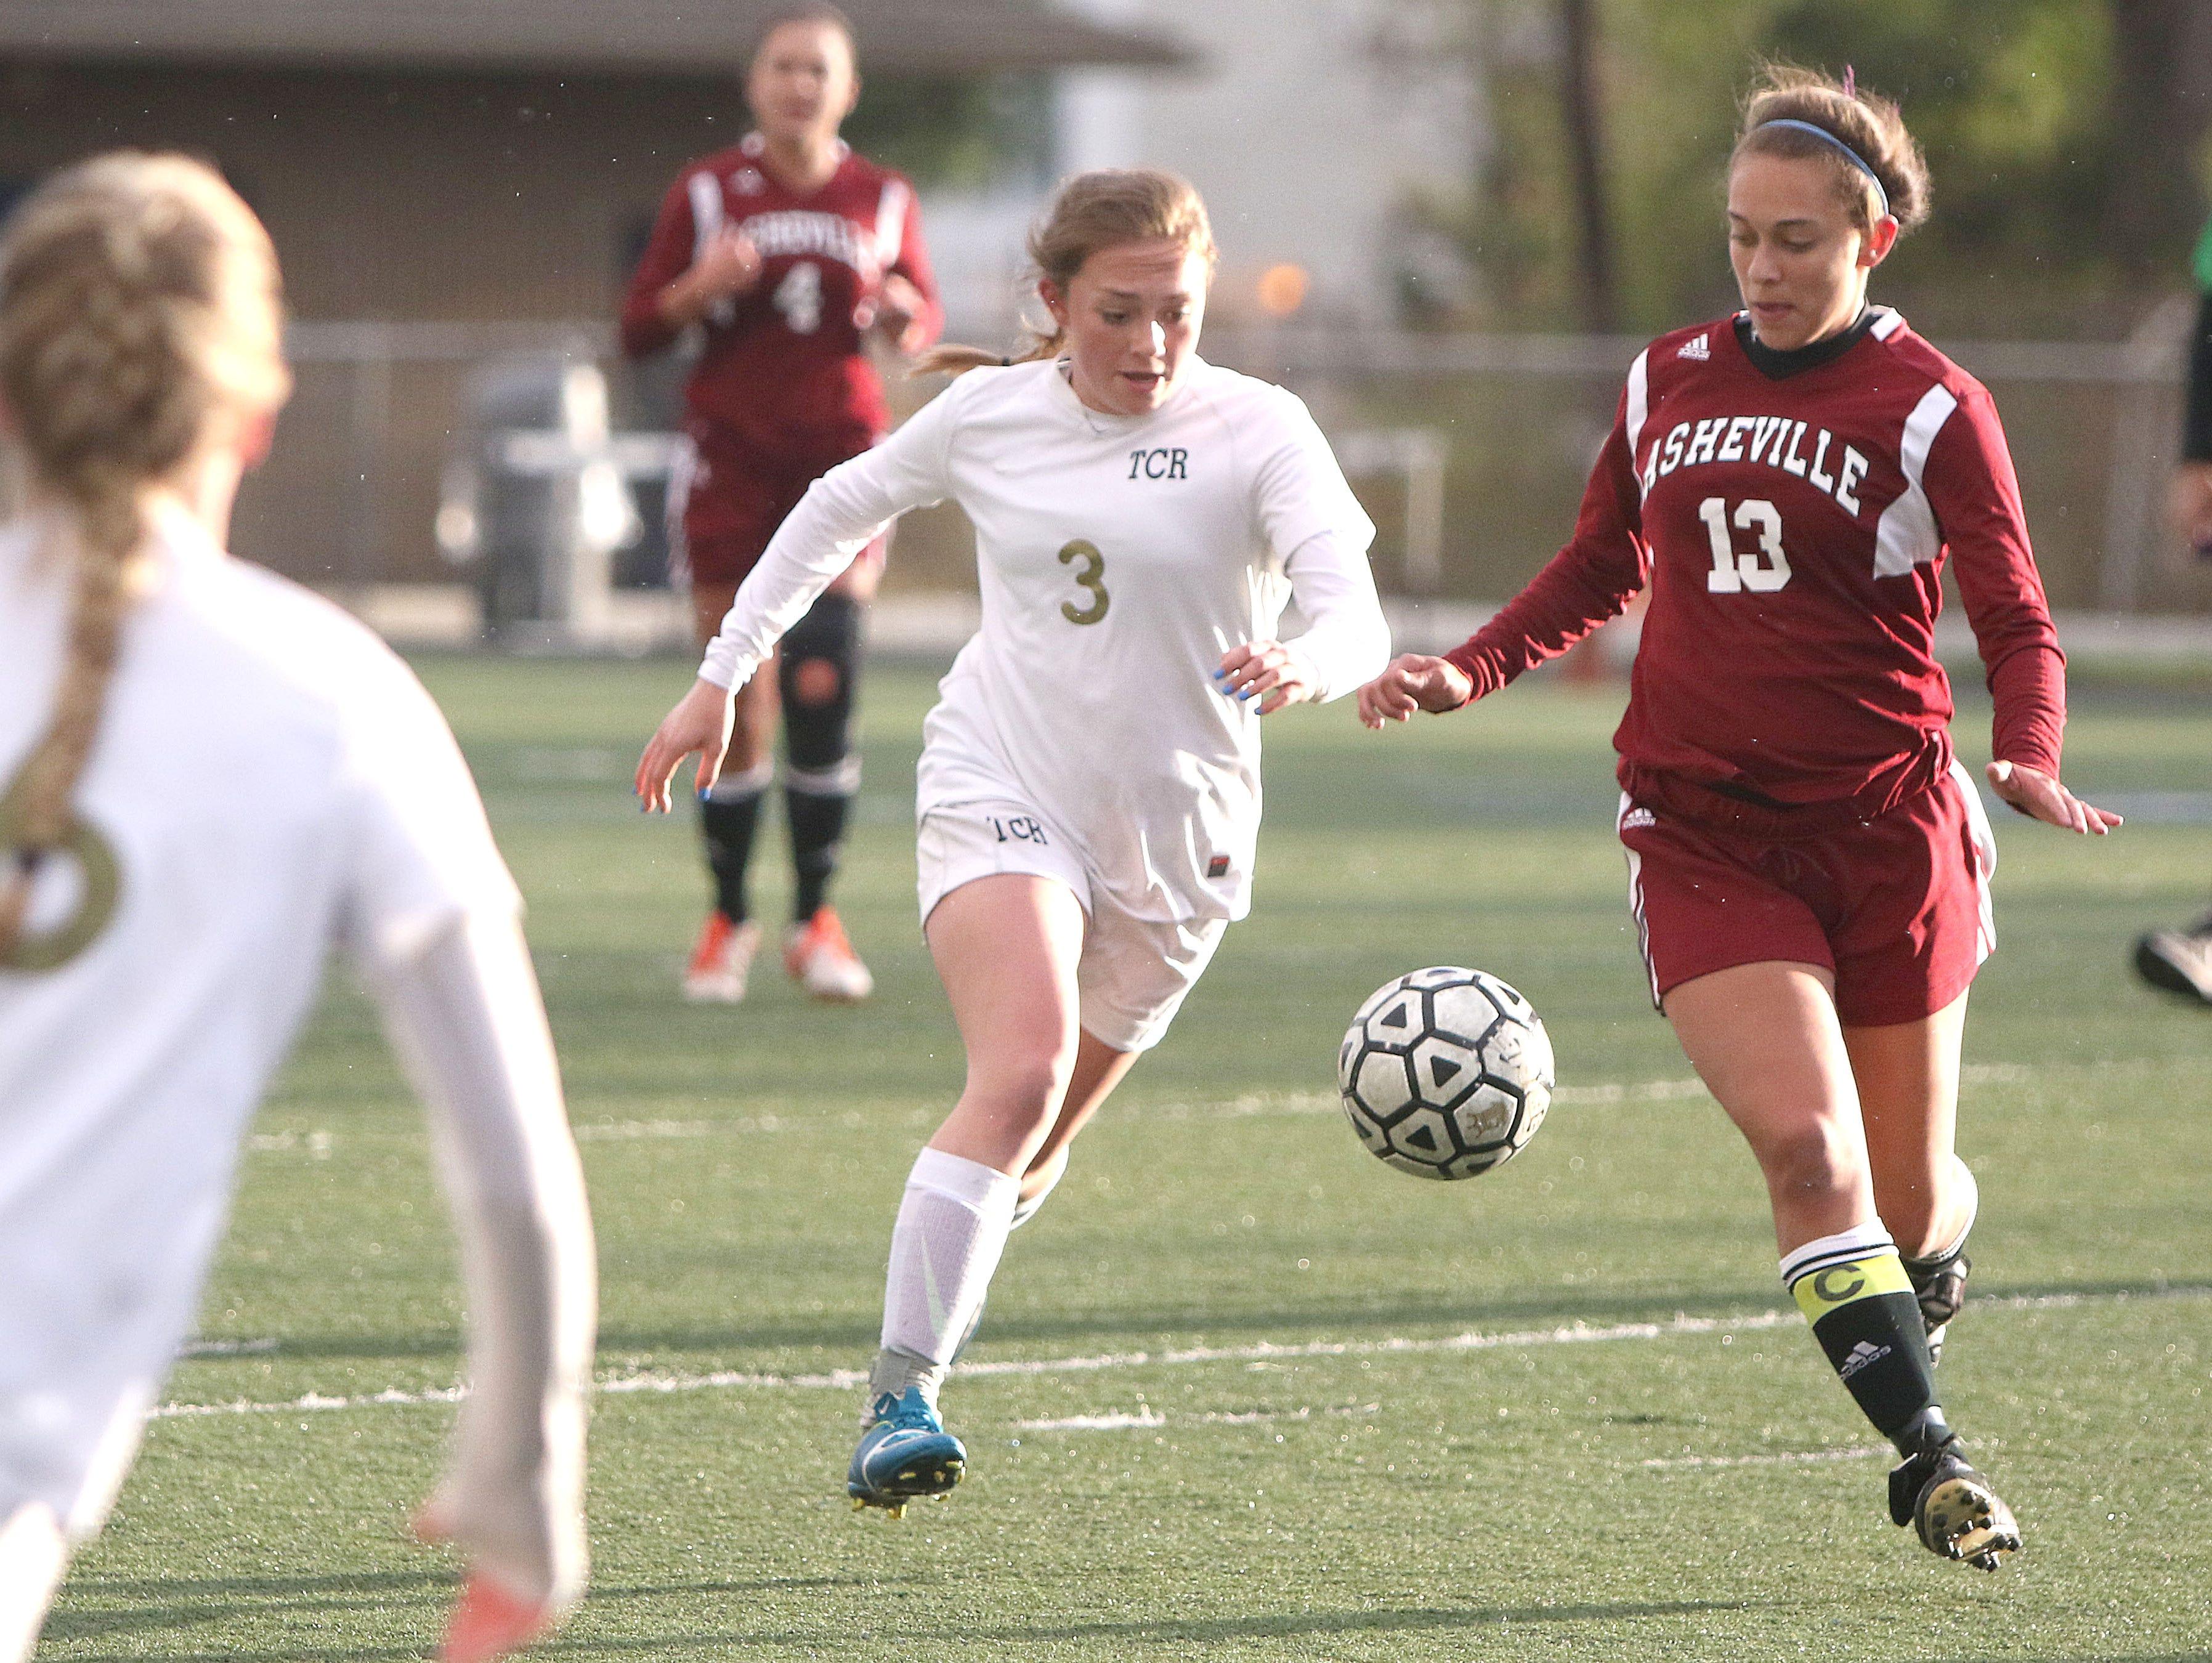 Roberson's Lauren Croft (3) and Asheville High's Kaileigh Mora (13).